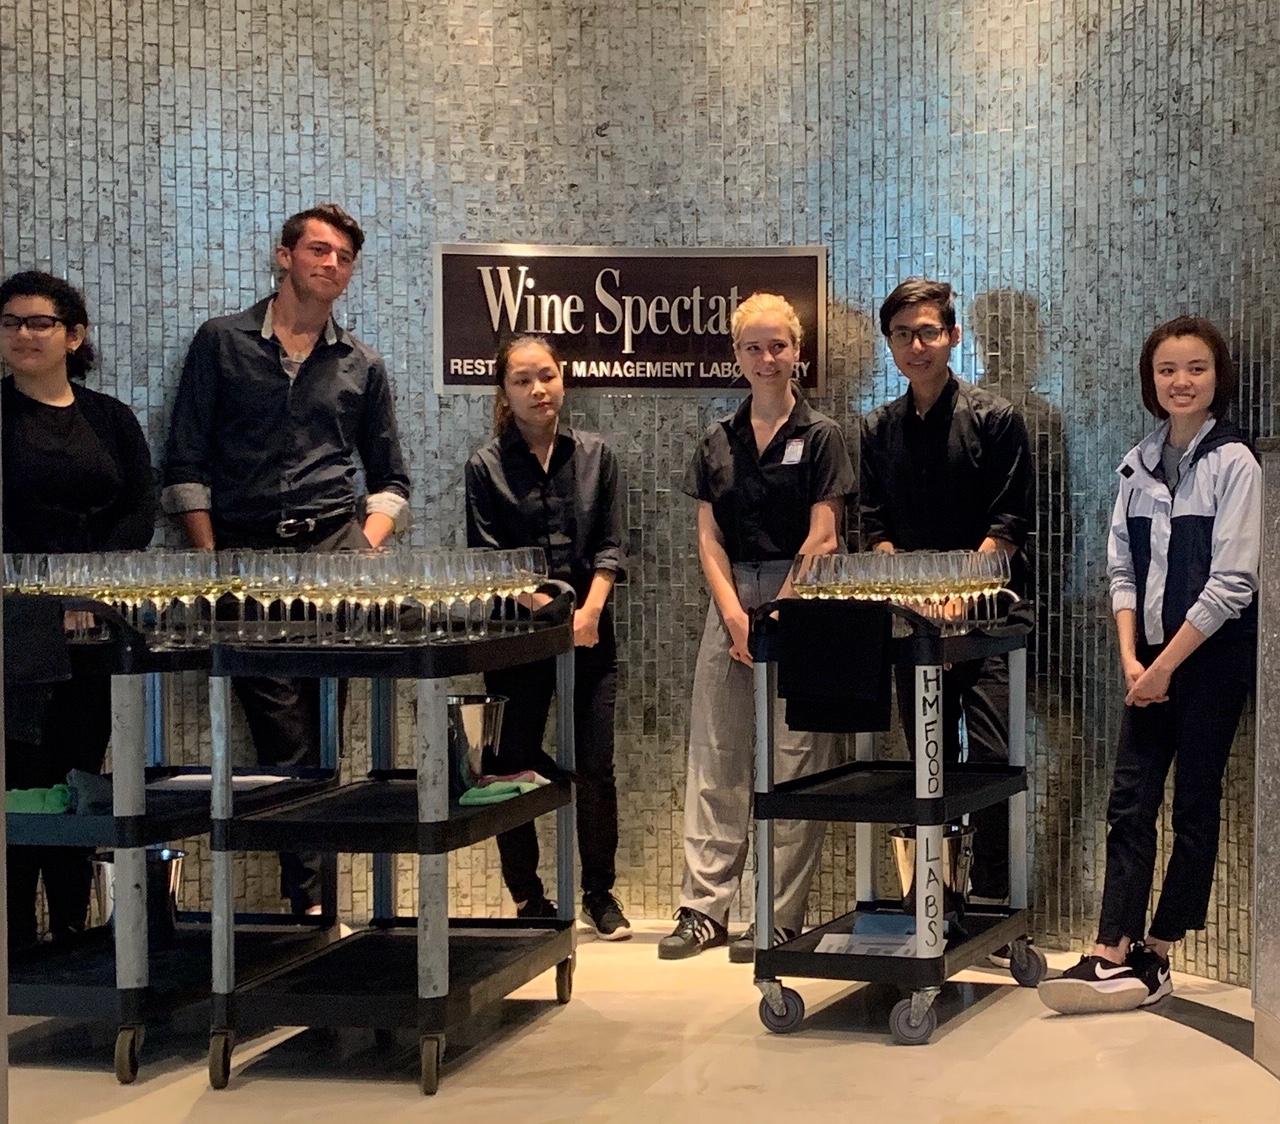 FIU School of Hospitality student volunteers dubbed Wine Angels